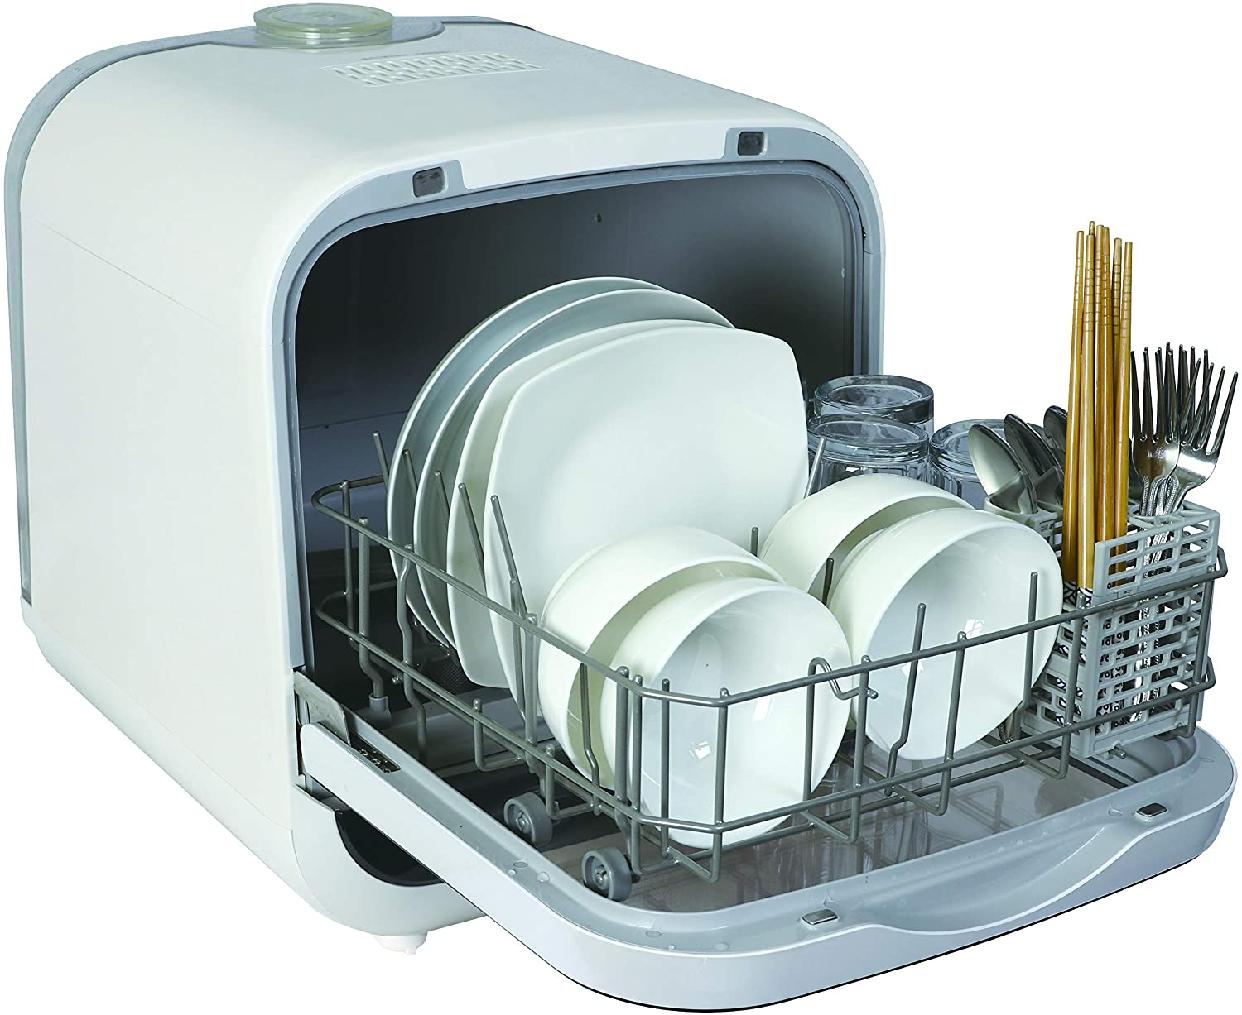 SK Japan(エスケイジャパン) 食器洗い乾燥機Jaime SDW-J5Lの商品画像3